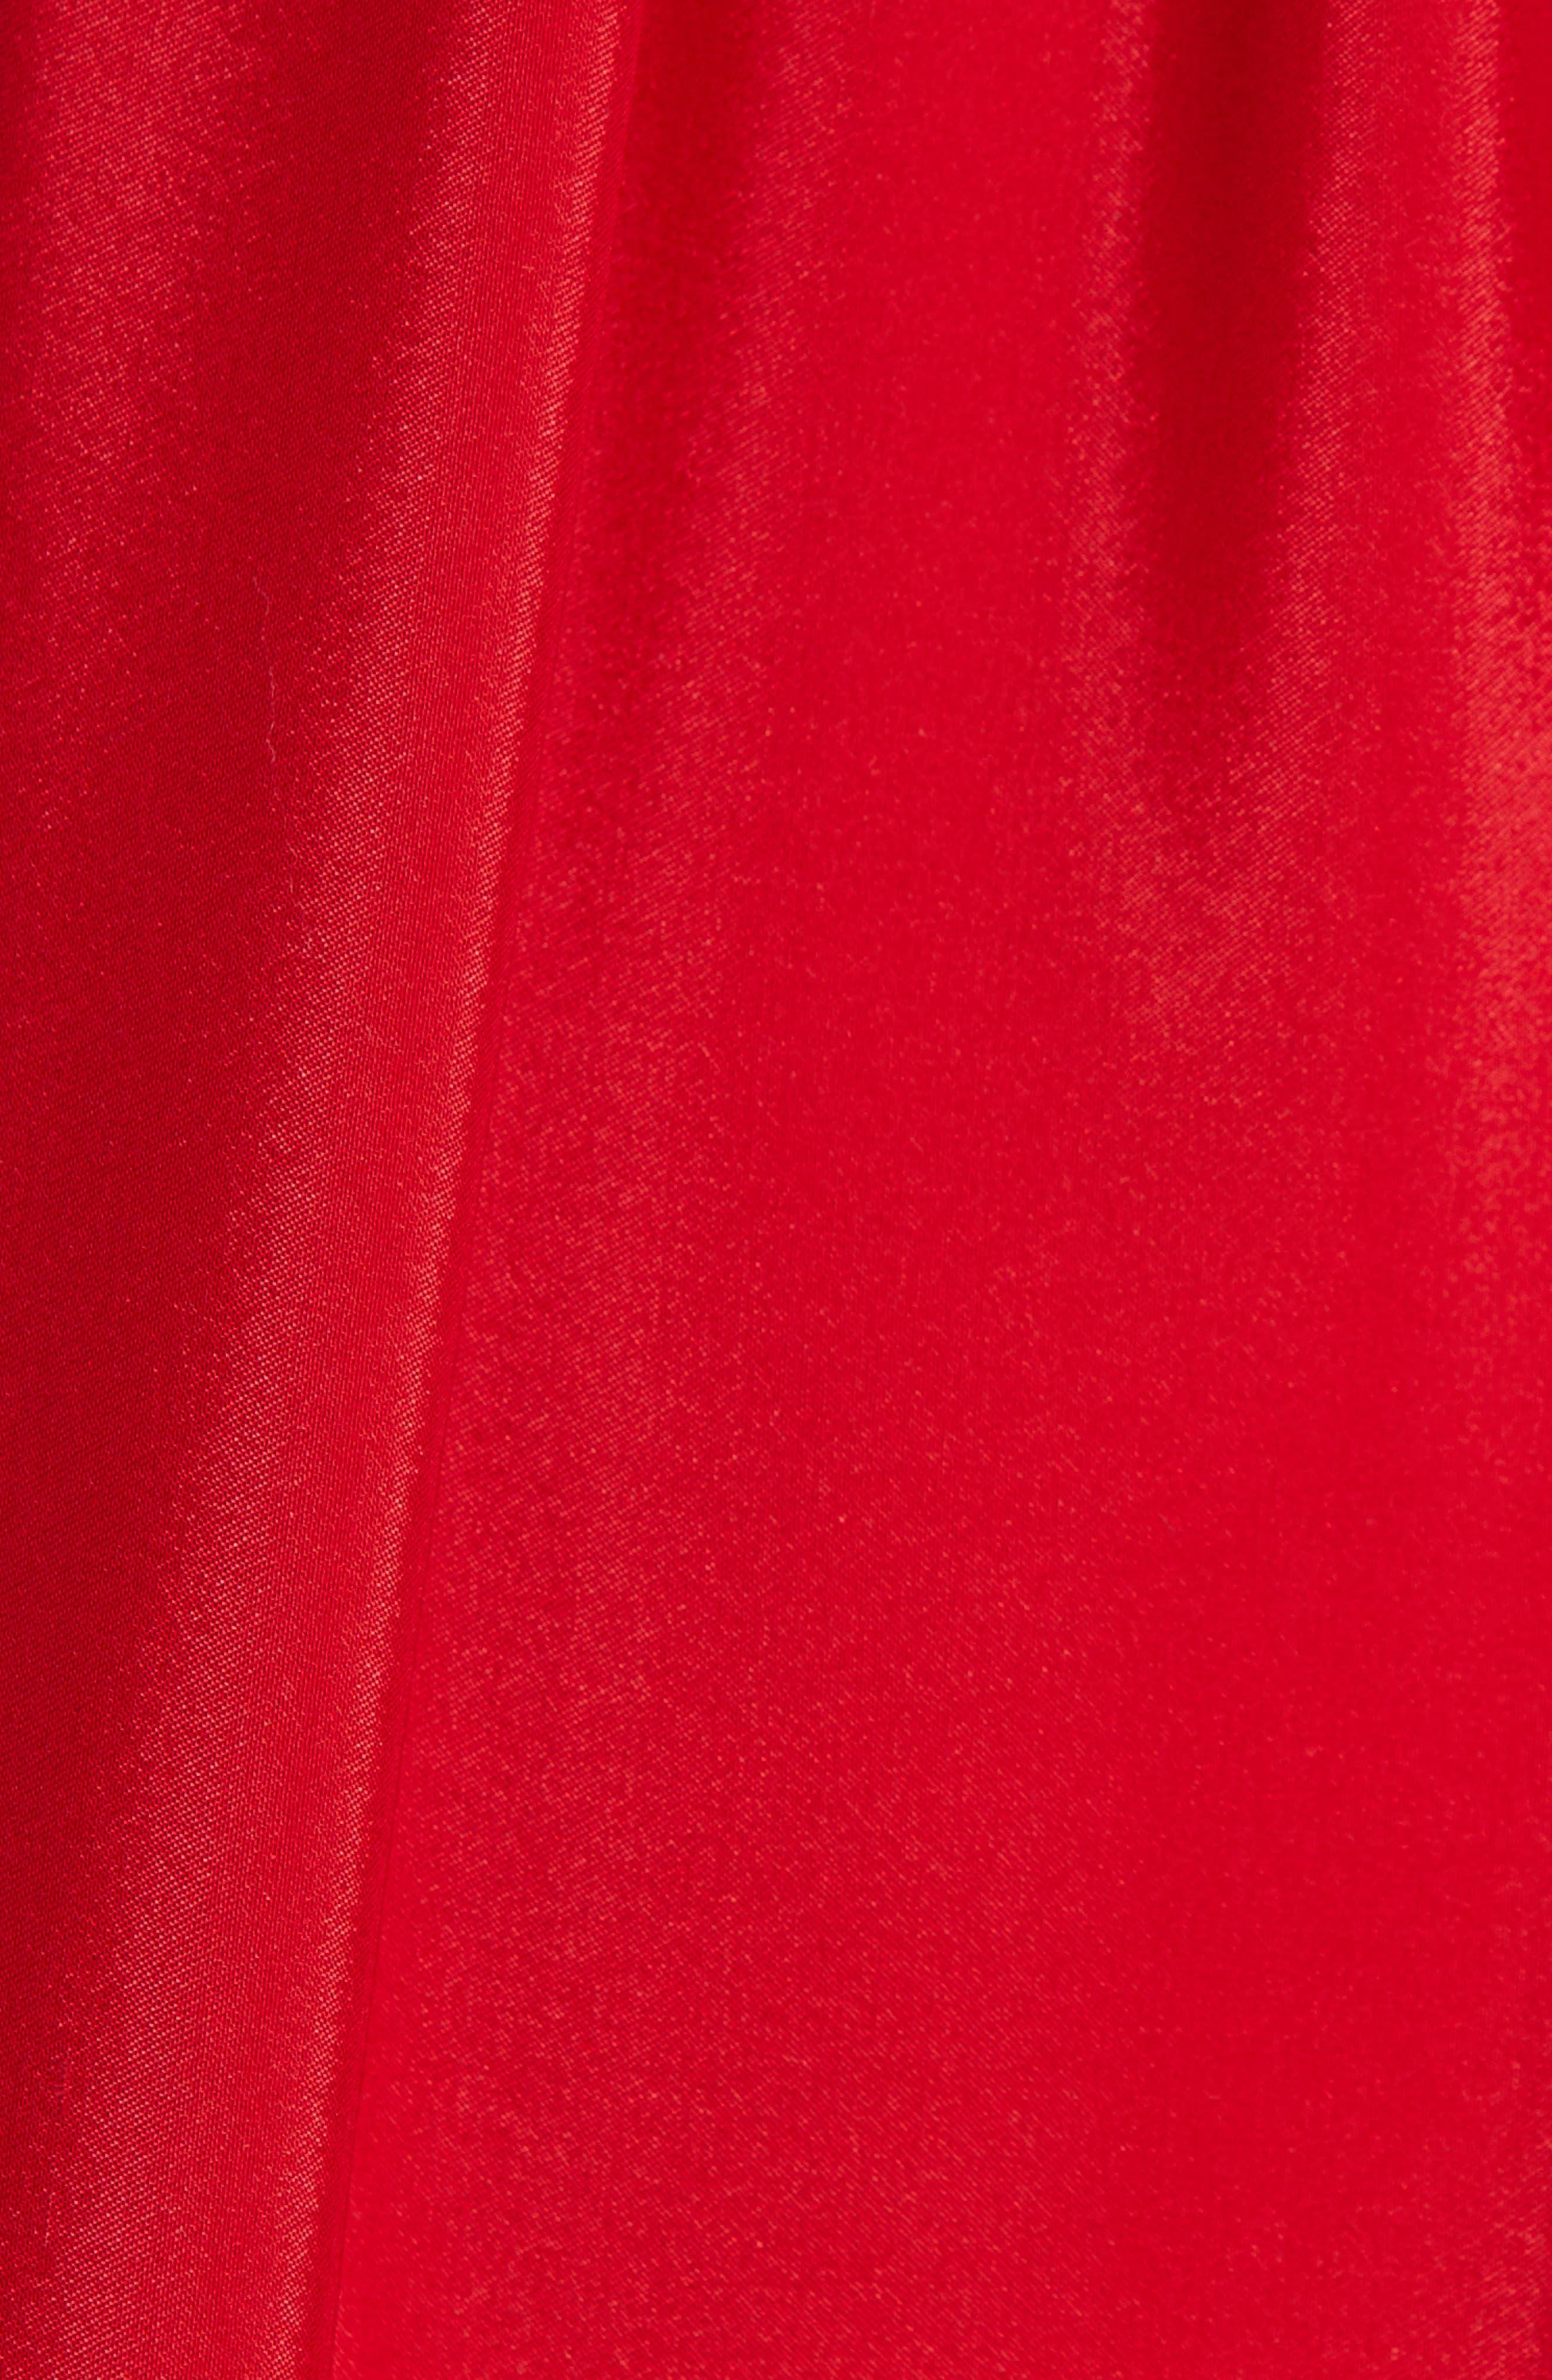 Moonlight Embroidered Silk Dress,                             Alternate thumbnail 5, color,                             VALENTINE